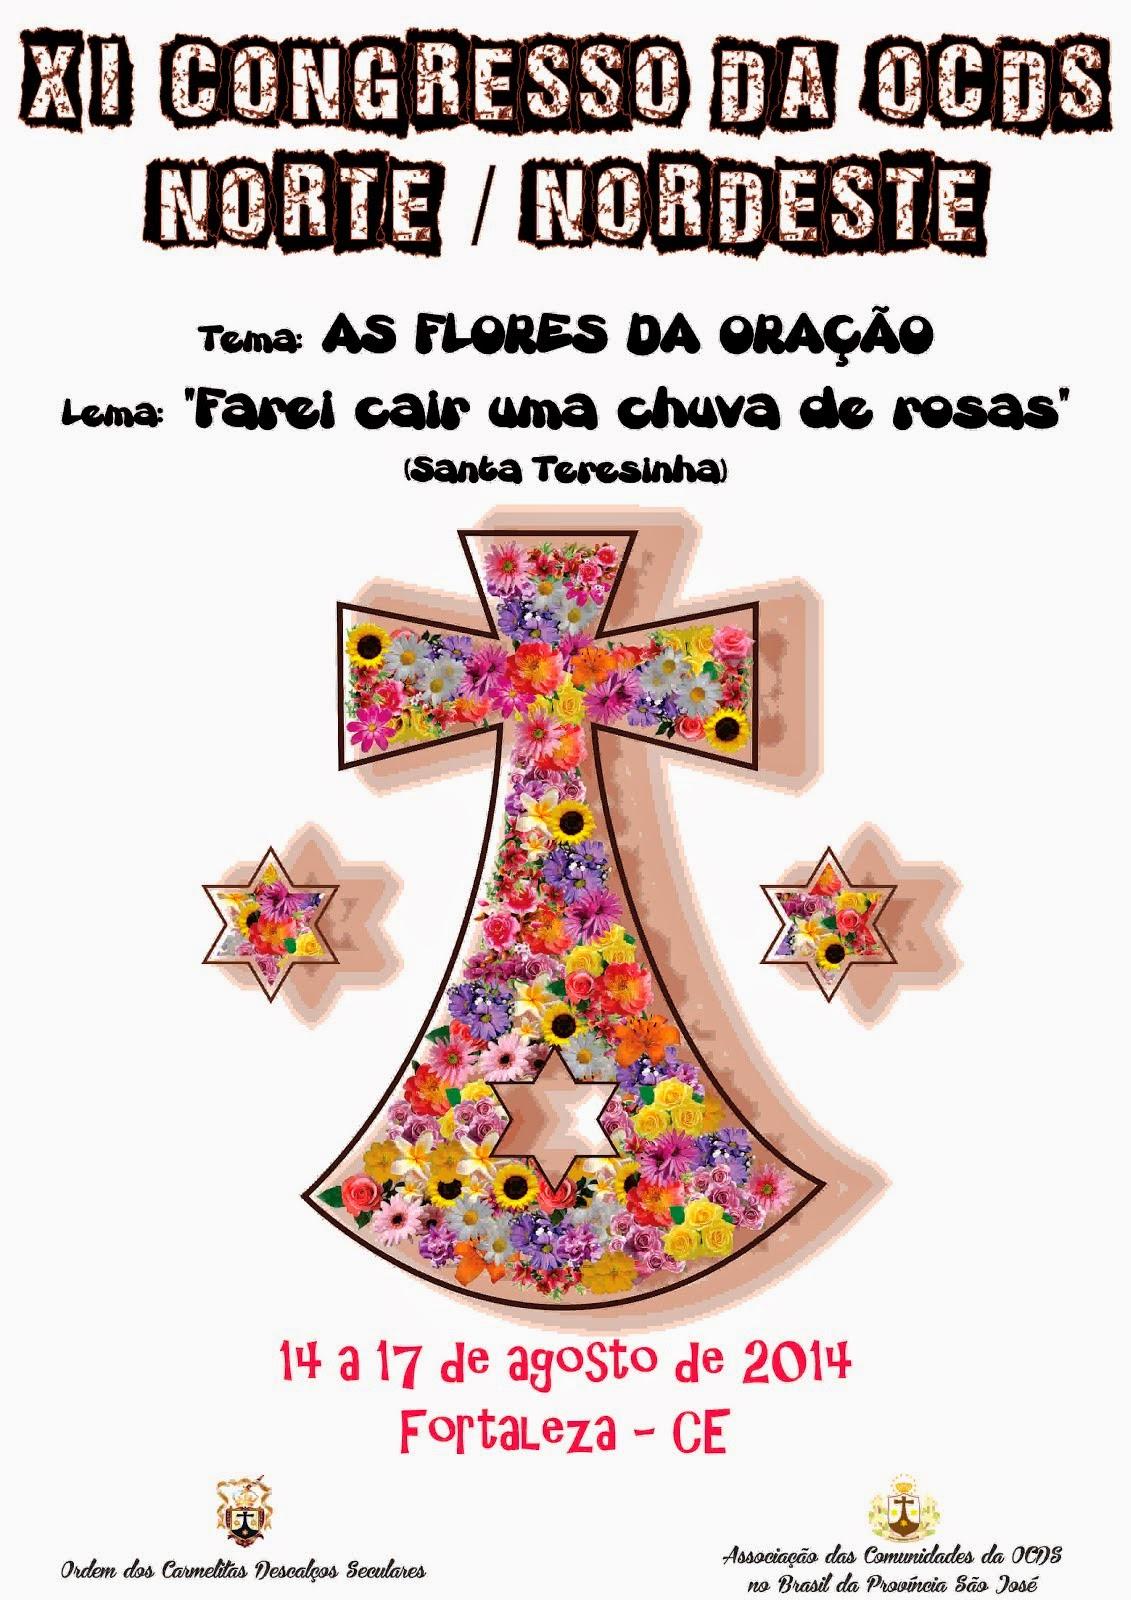 PALESTRAS DO XI CONGRESSO DA OCDS NORTE/NORDESTE